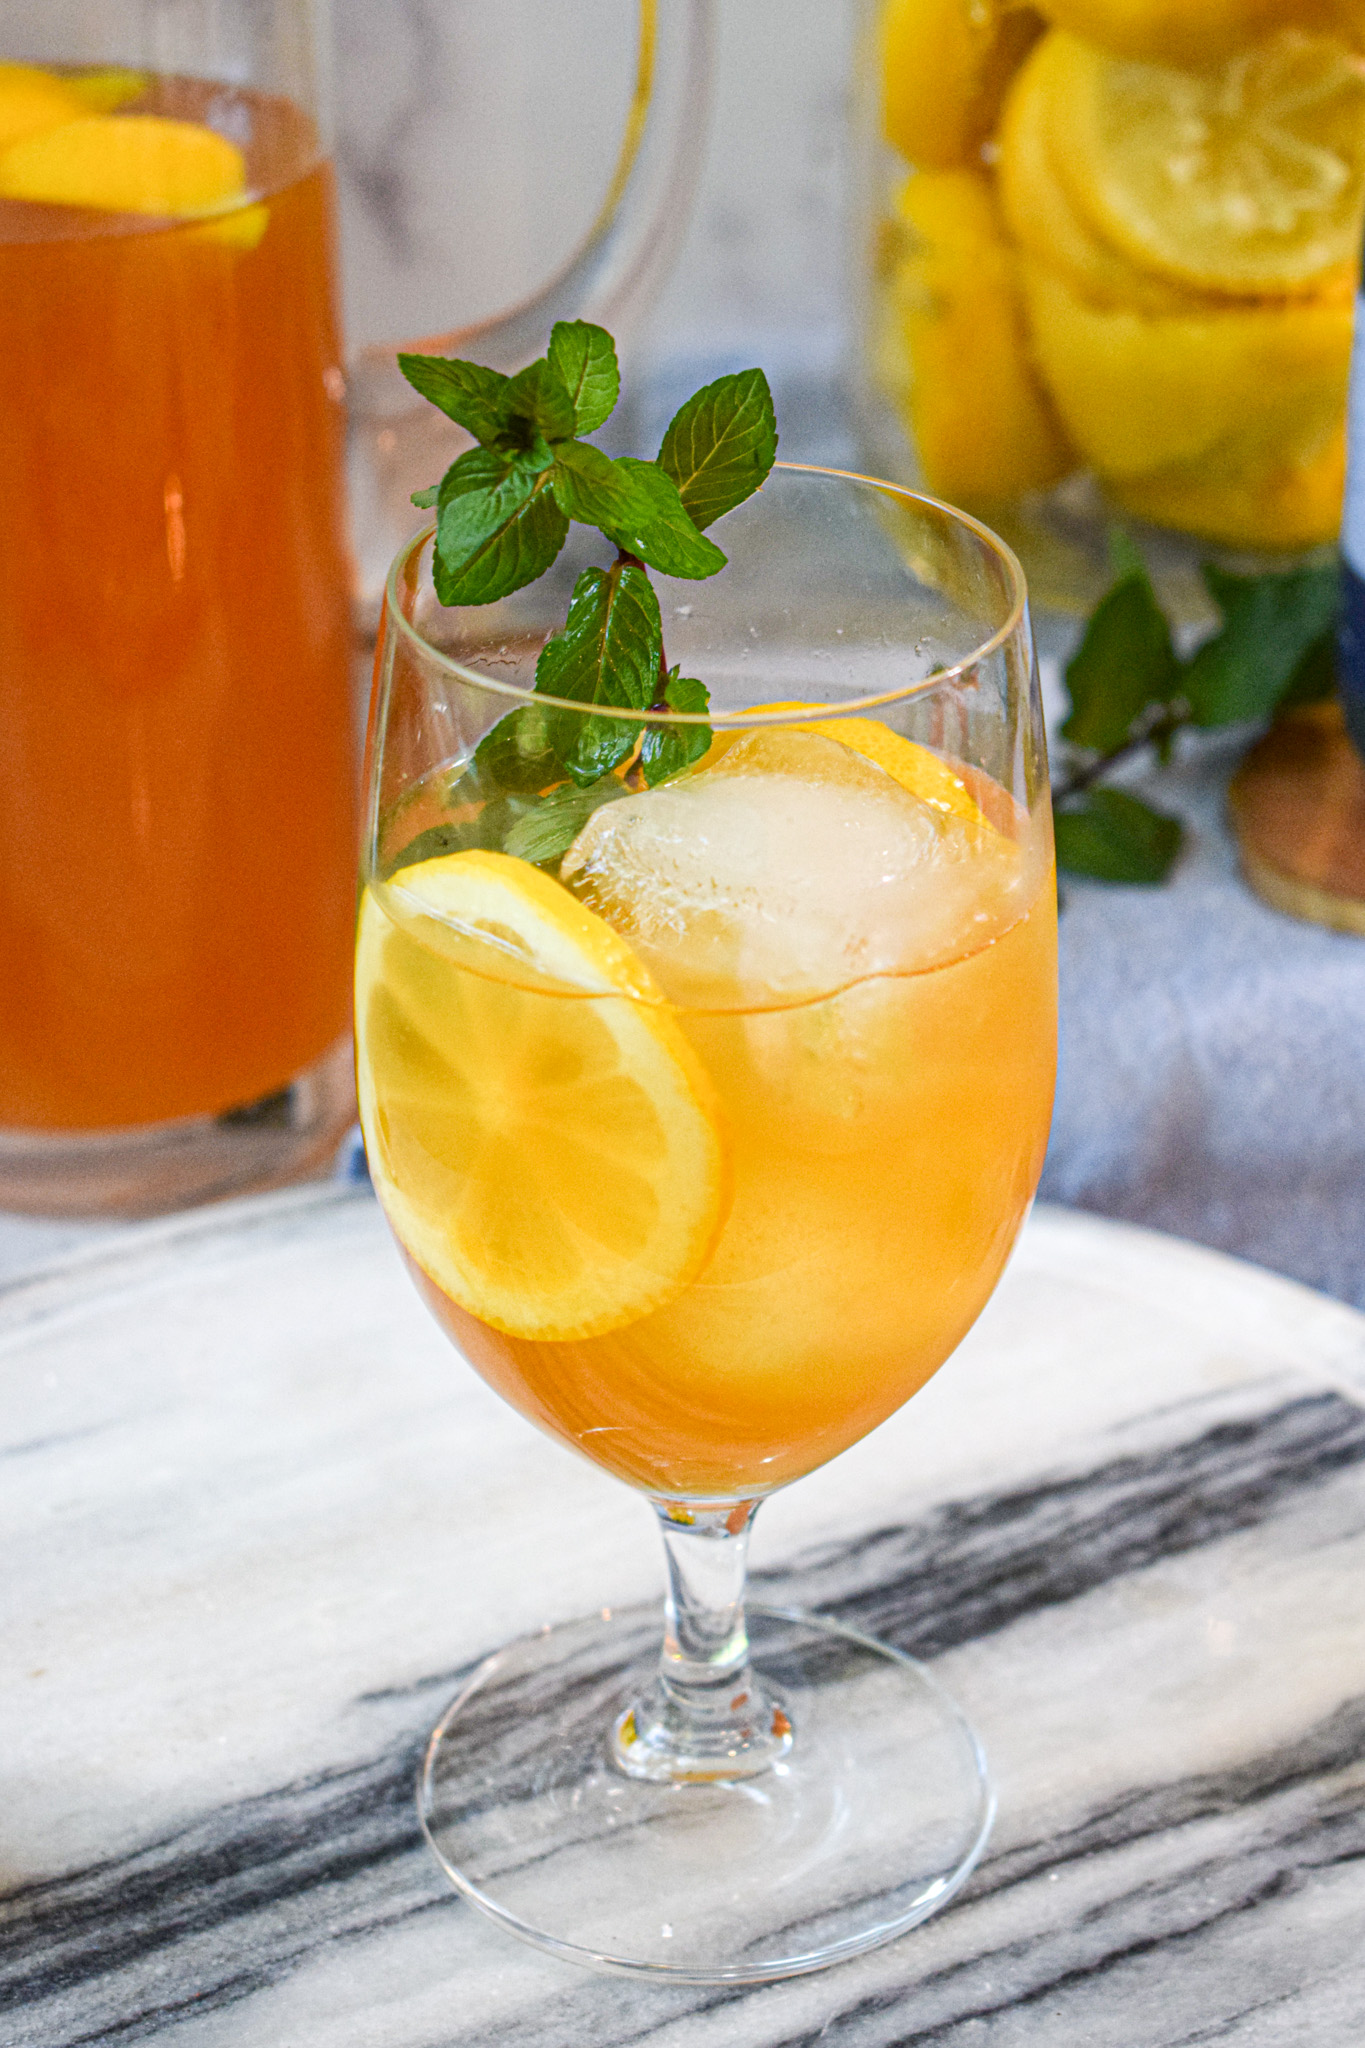 homemade iced tea lemonade recipe from scratch